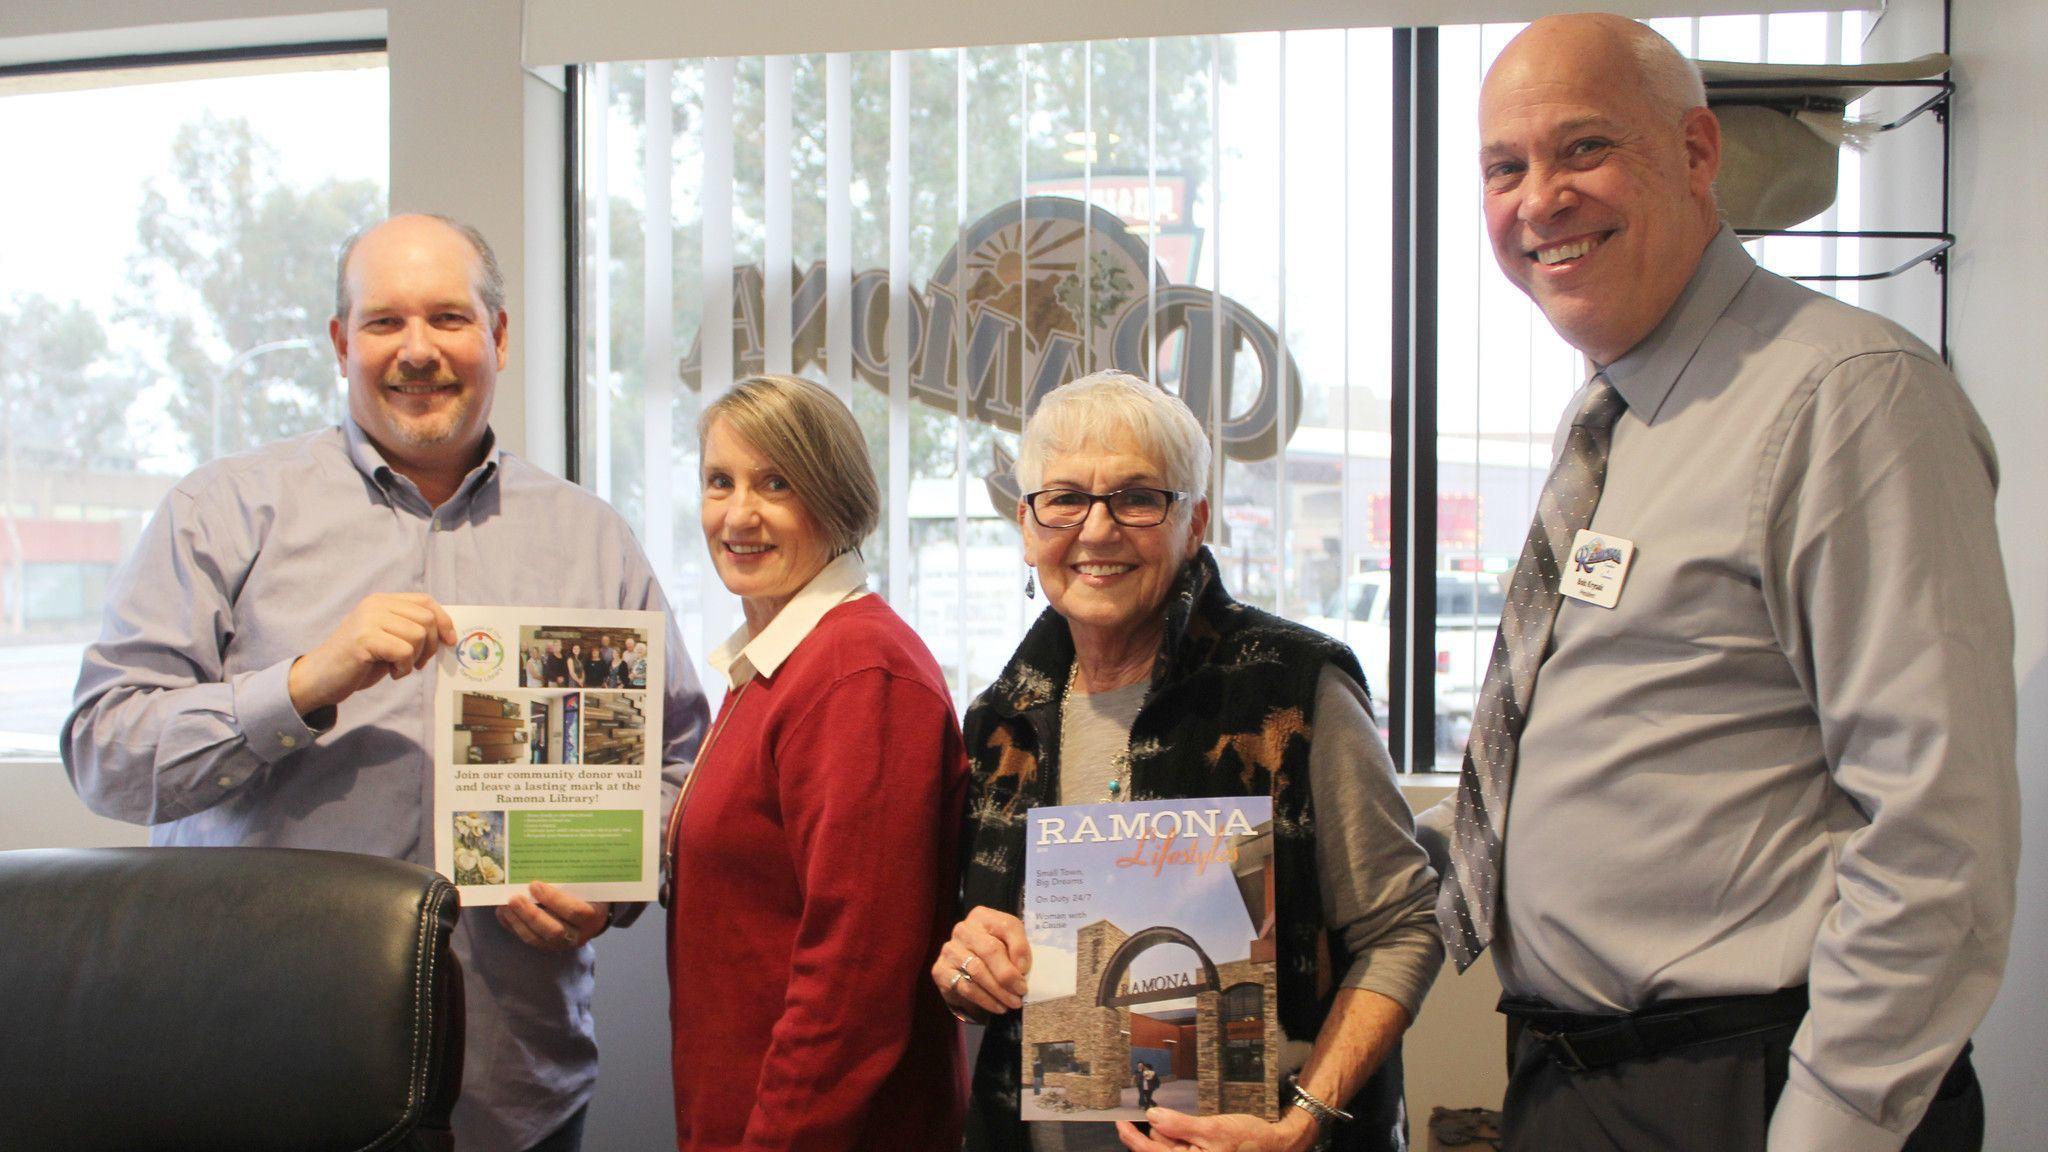 Joe Stupar, left, Ramona chamber's executive director, and Bob Krysak, chamber president, visit with Friends of Ramona Library President Debby Novak, Membership Chair Patsy Heald.